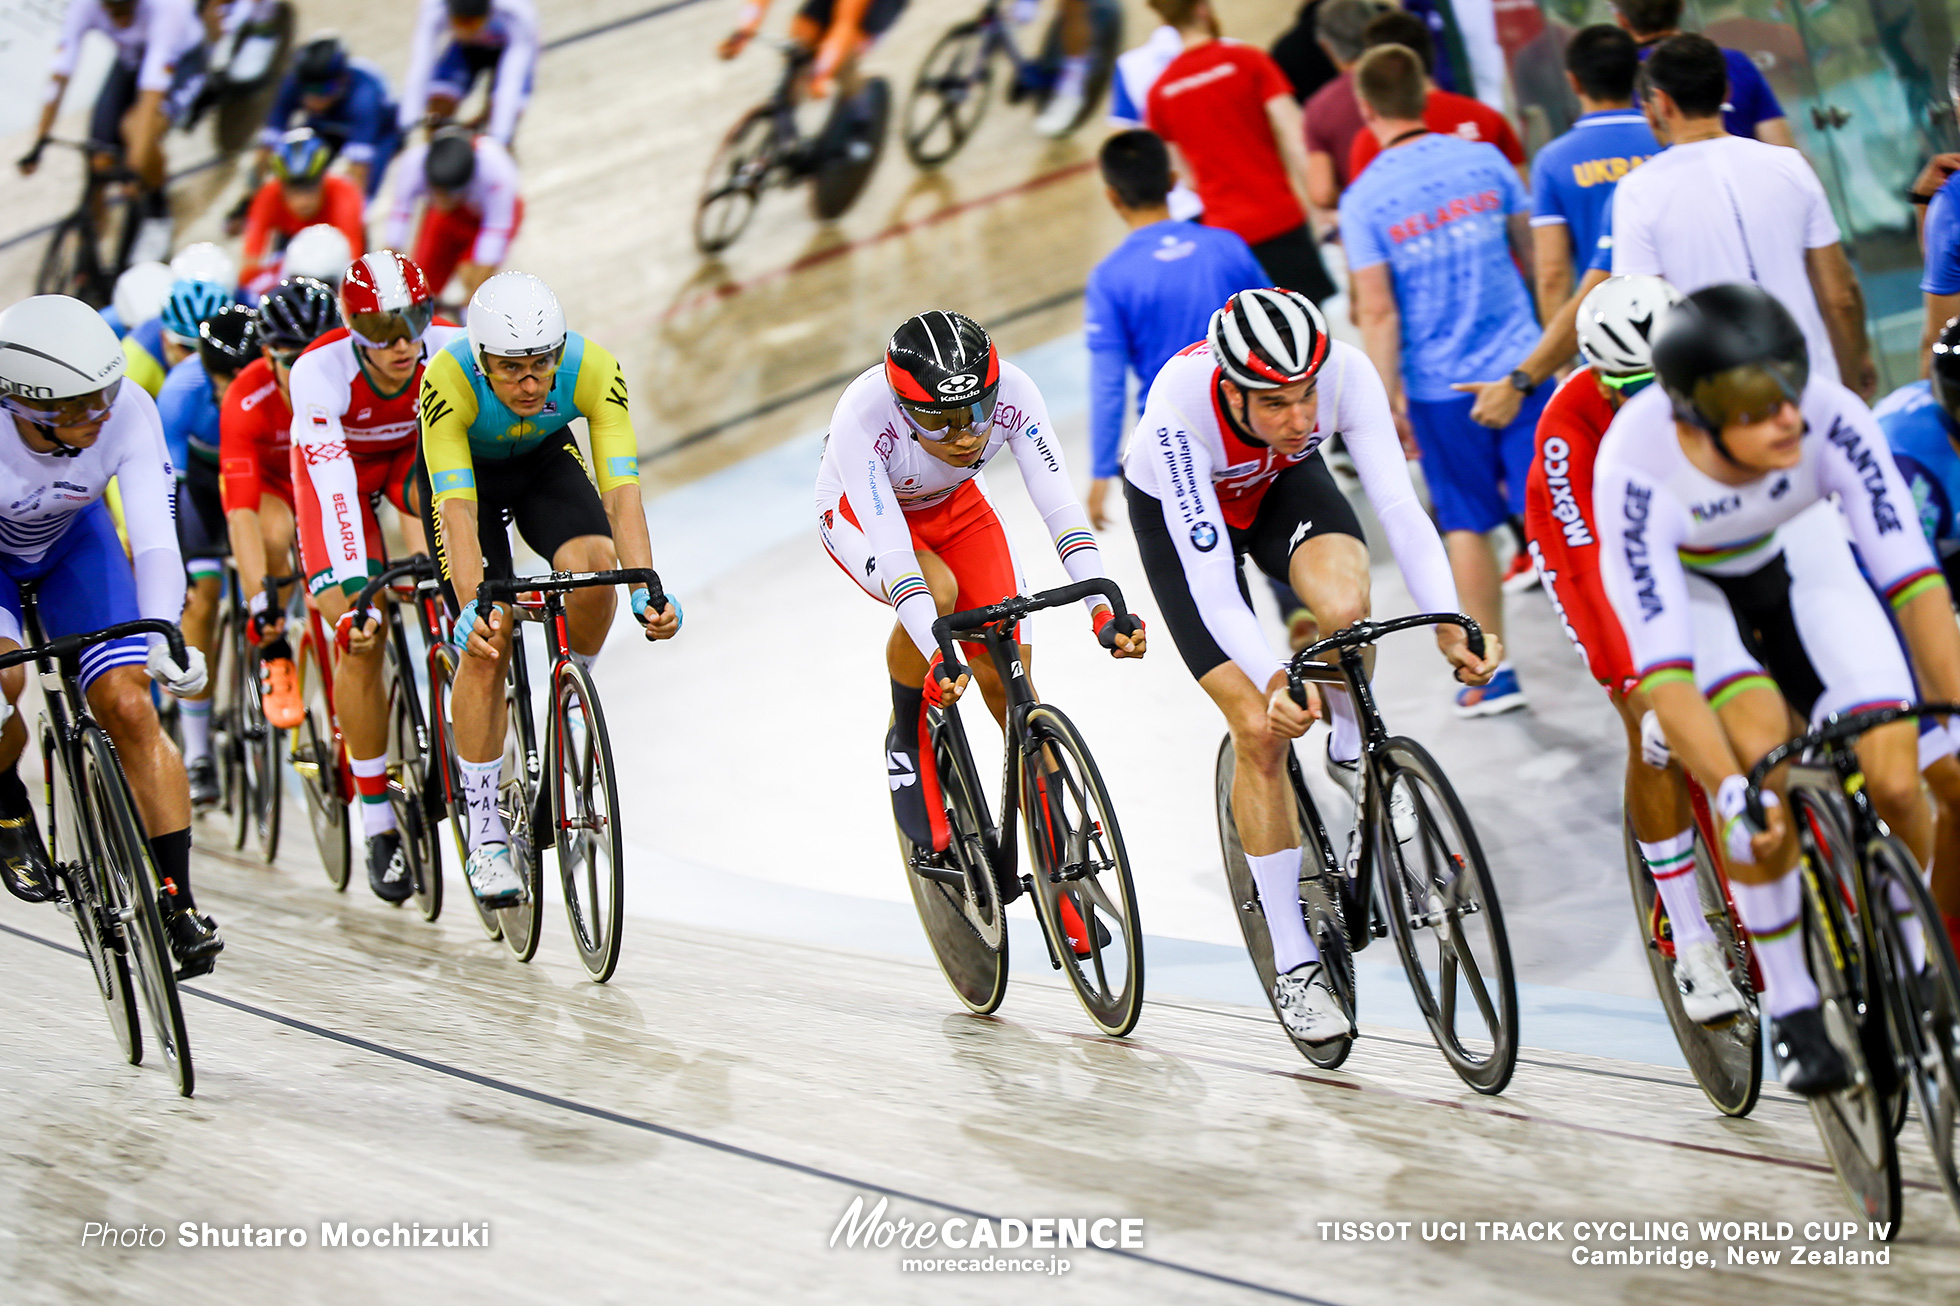 Scratch Race / Men's Omnium / TISSOT UCI TRACK CYCLING WORLD CUP IV, Cambridge, New Zealand